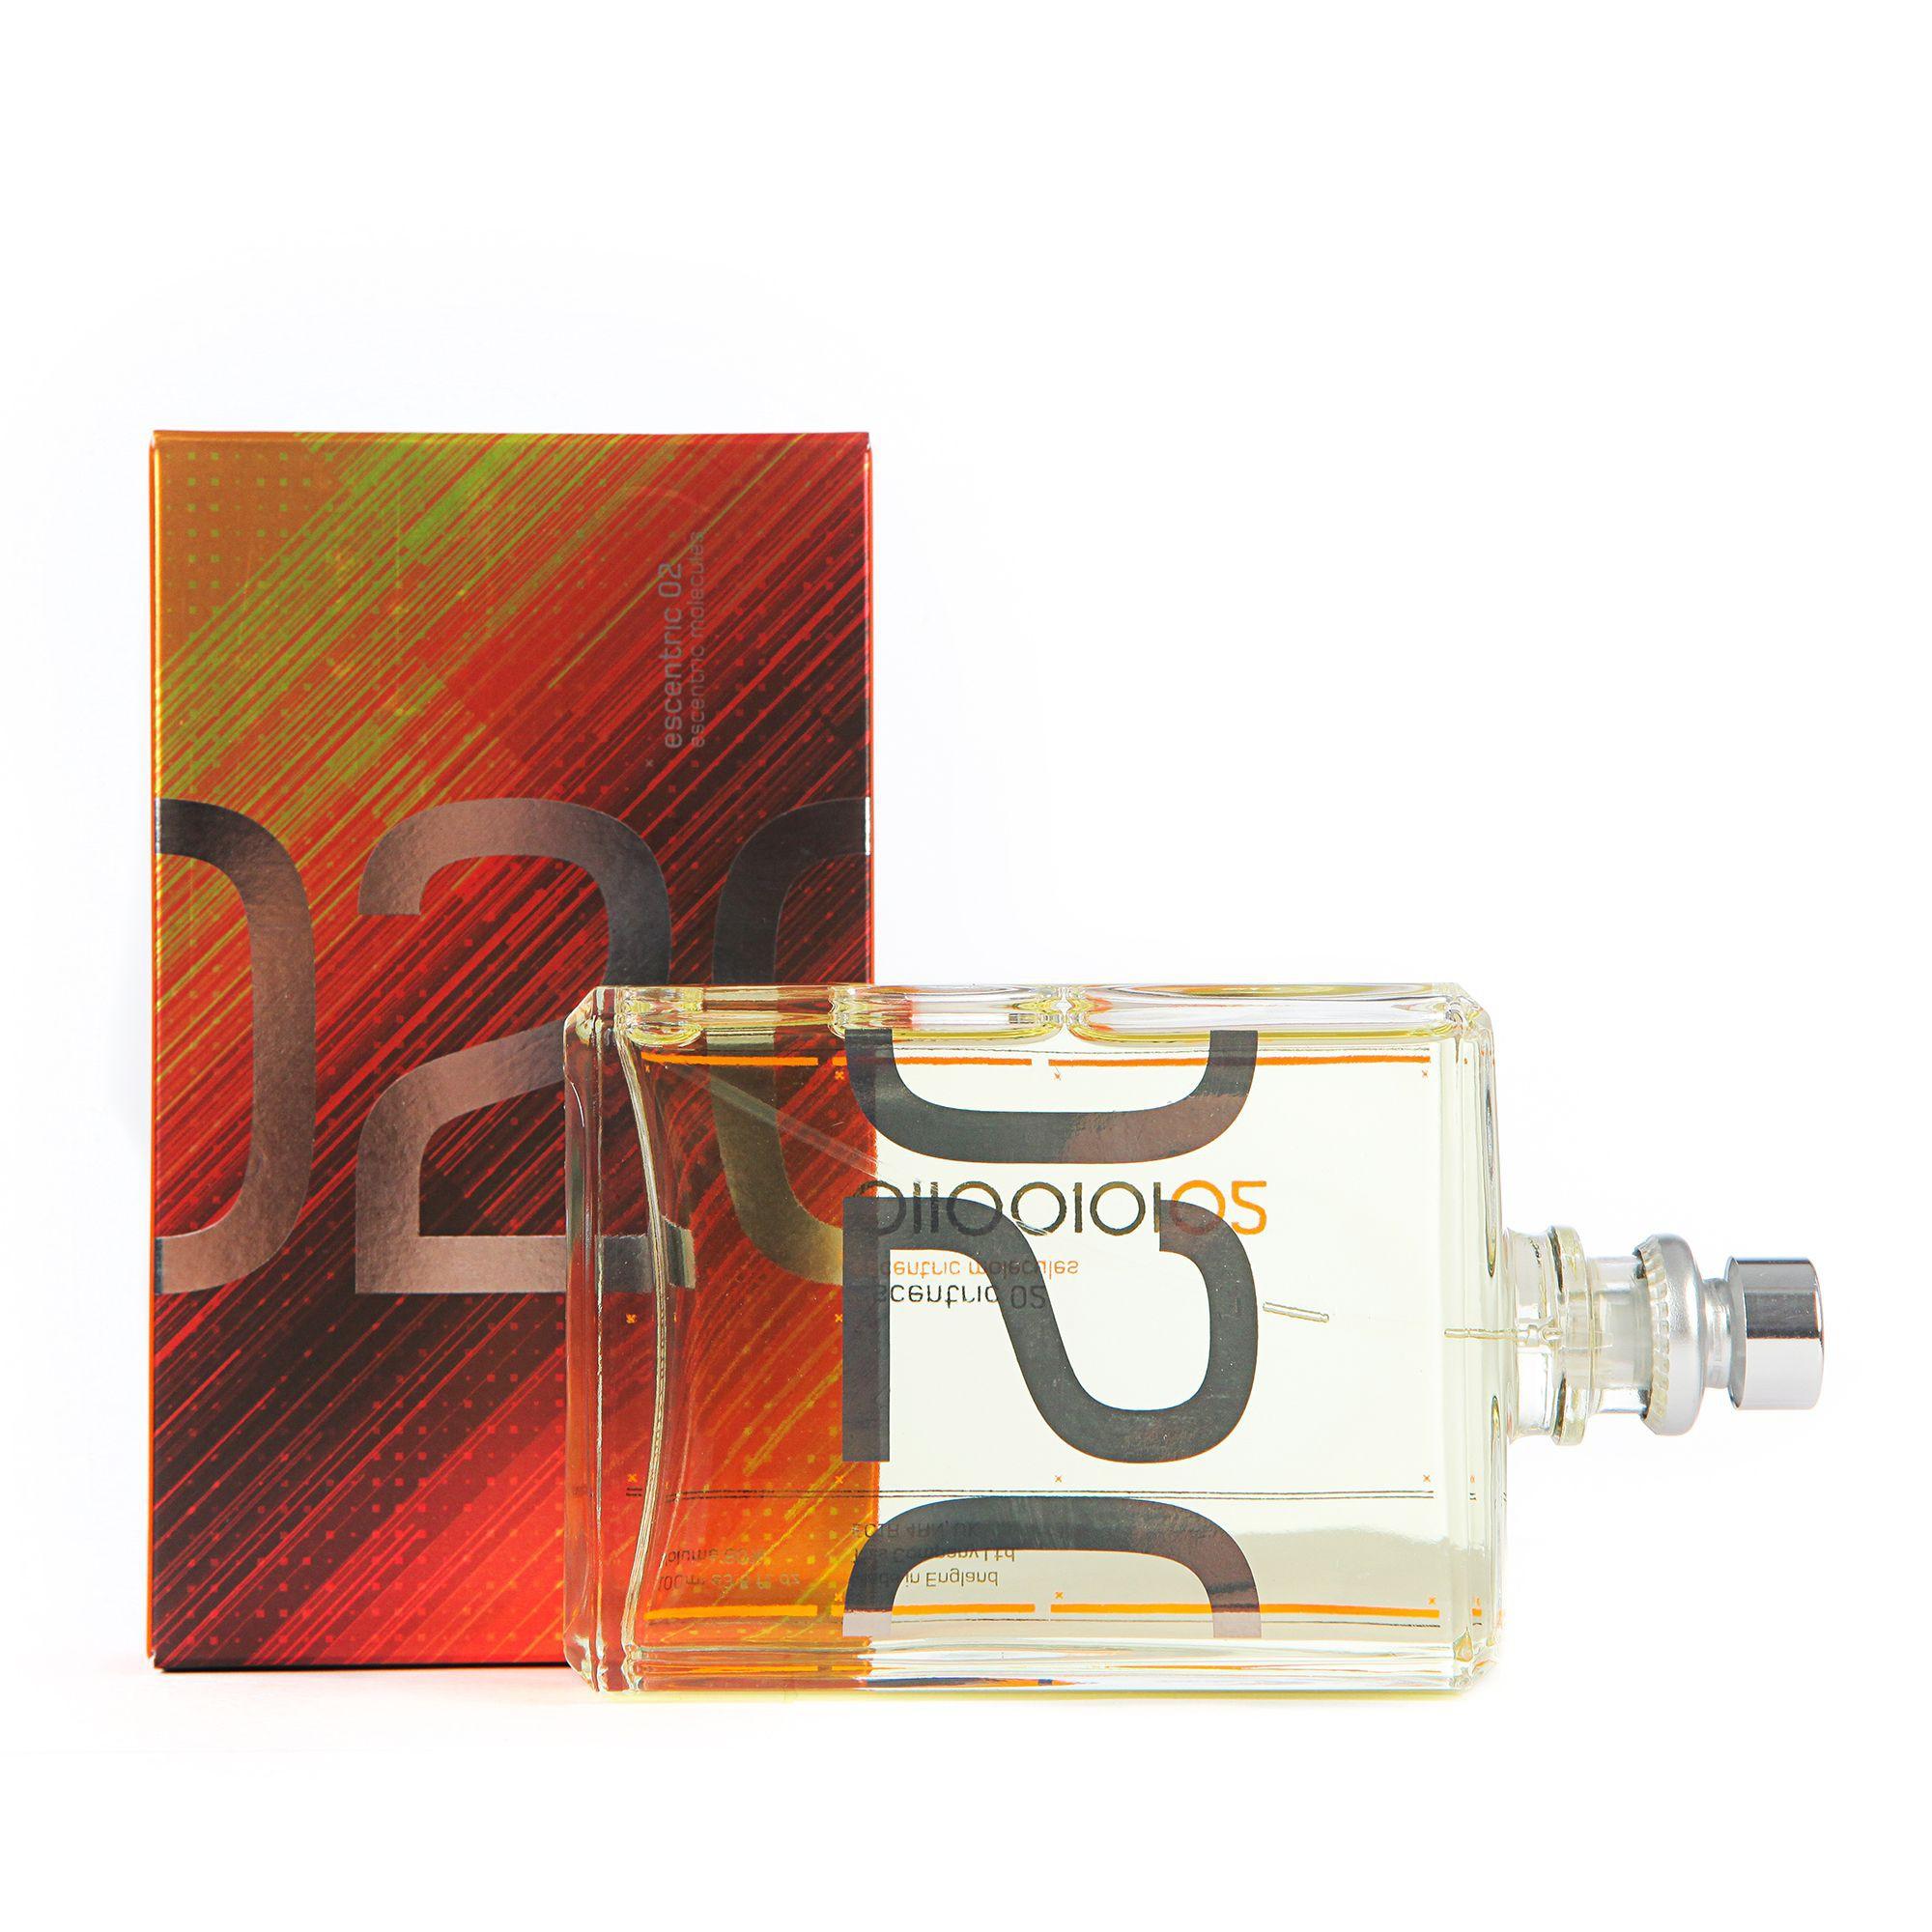 Escentric Molecules Escentric 02 аромат для мужчин и женщин